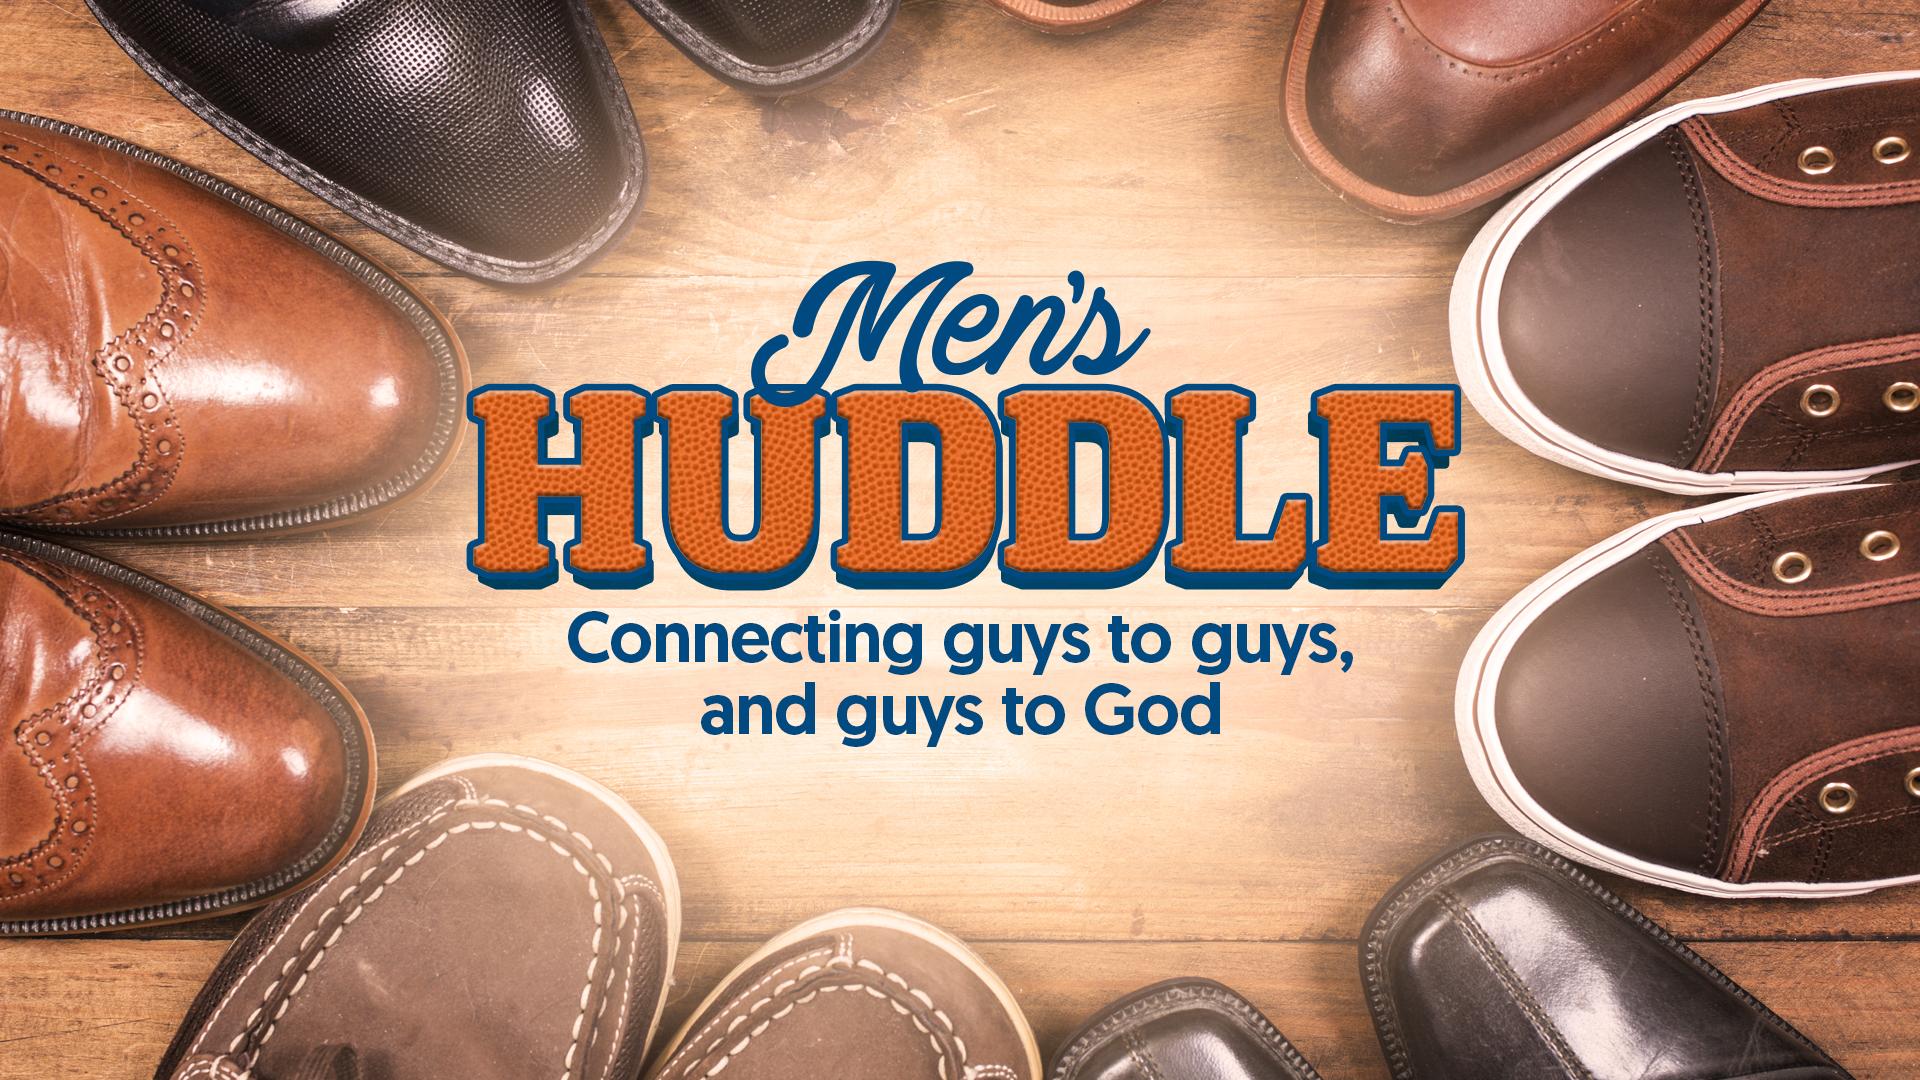 Men's Ministry HUDDLE